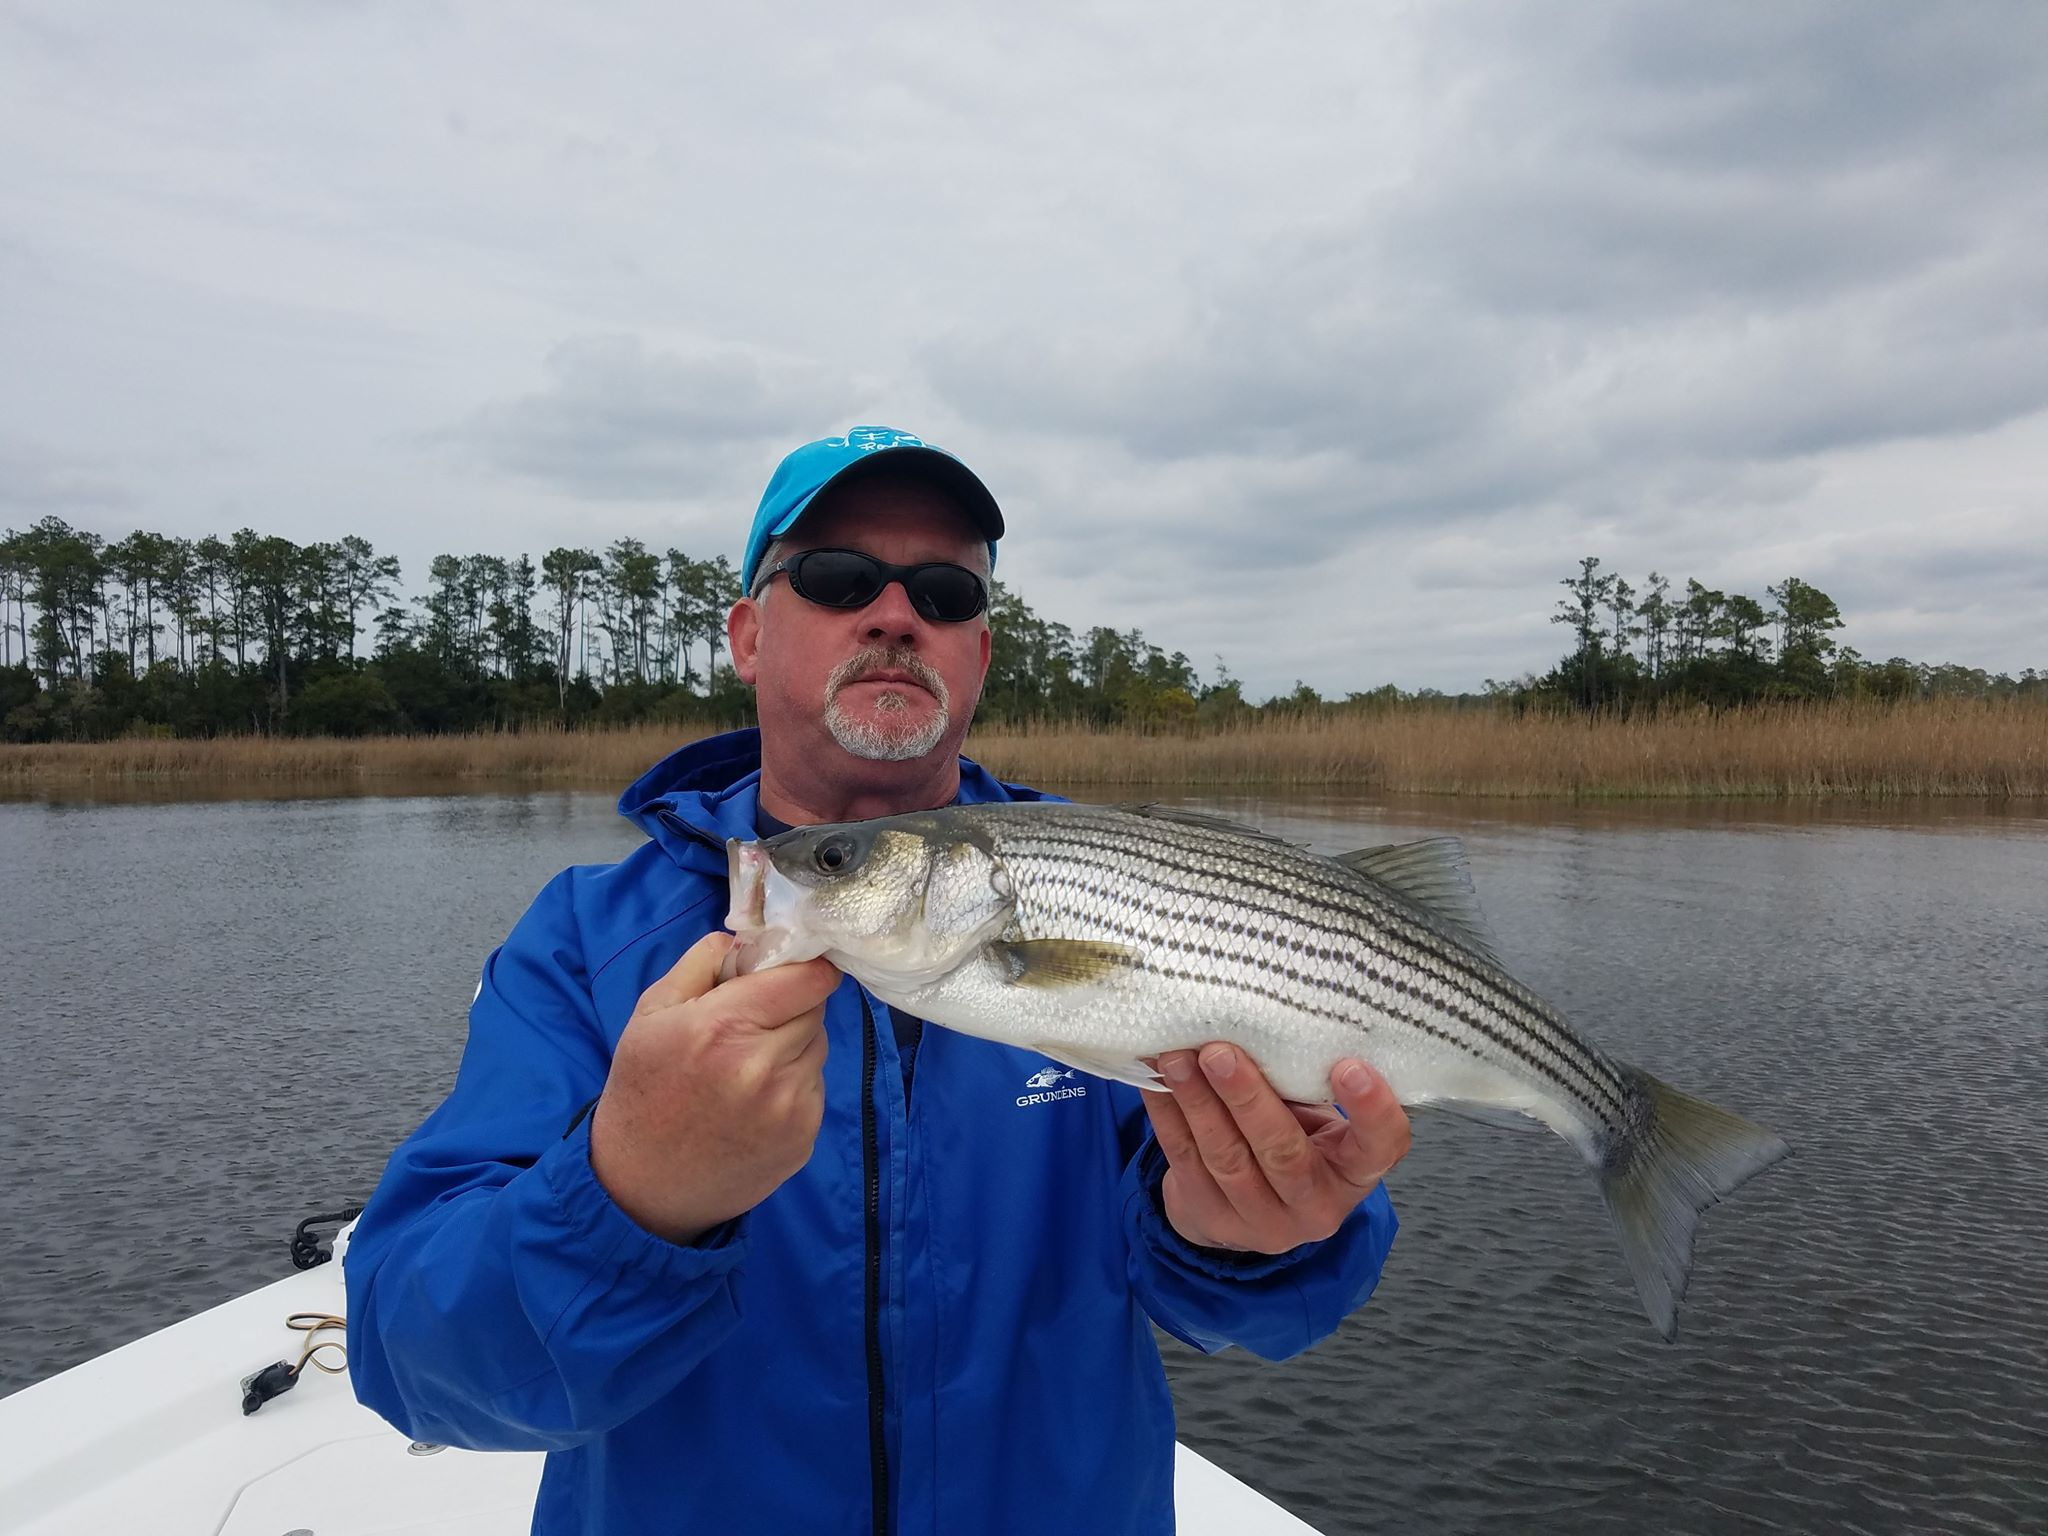 Neuse river fishing report april 19 2018 for Neuse river fishing report